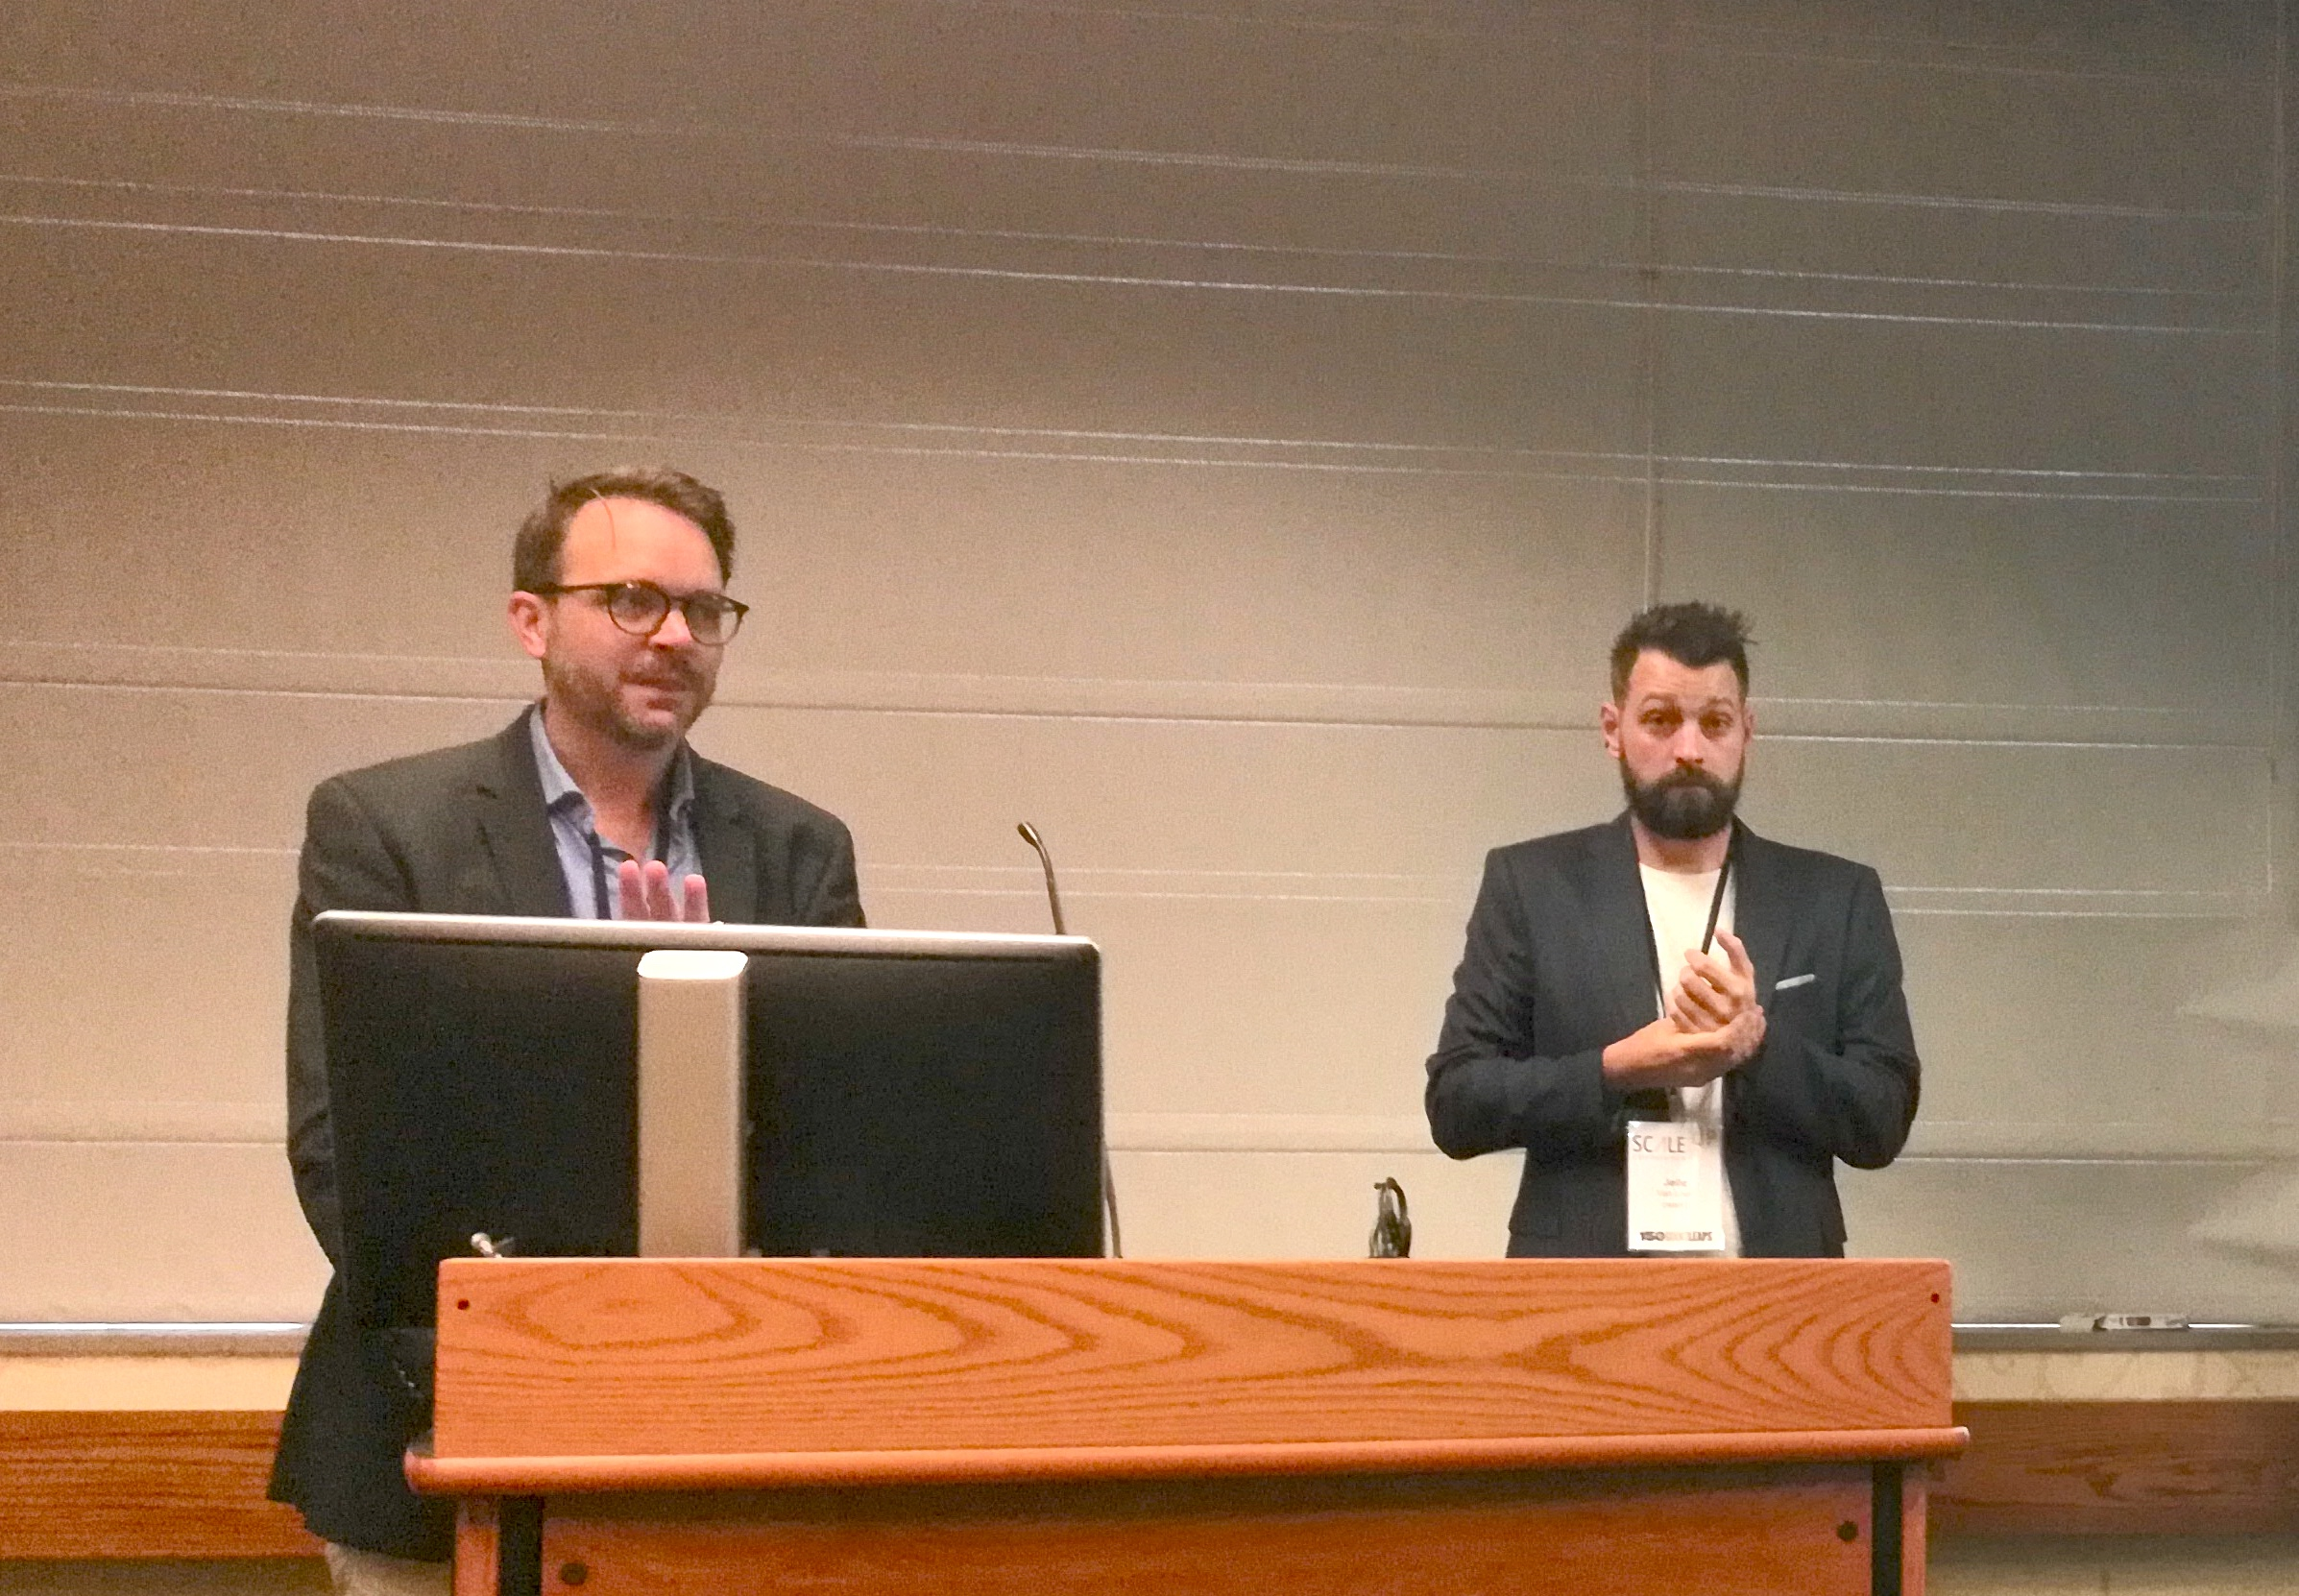 CIMMYT's scaling advisor Lennart Woltering (left) and mechanization specialist Jelle van Loon led a session. (Photo: Rachel Cramer/CIMMYT)